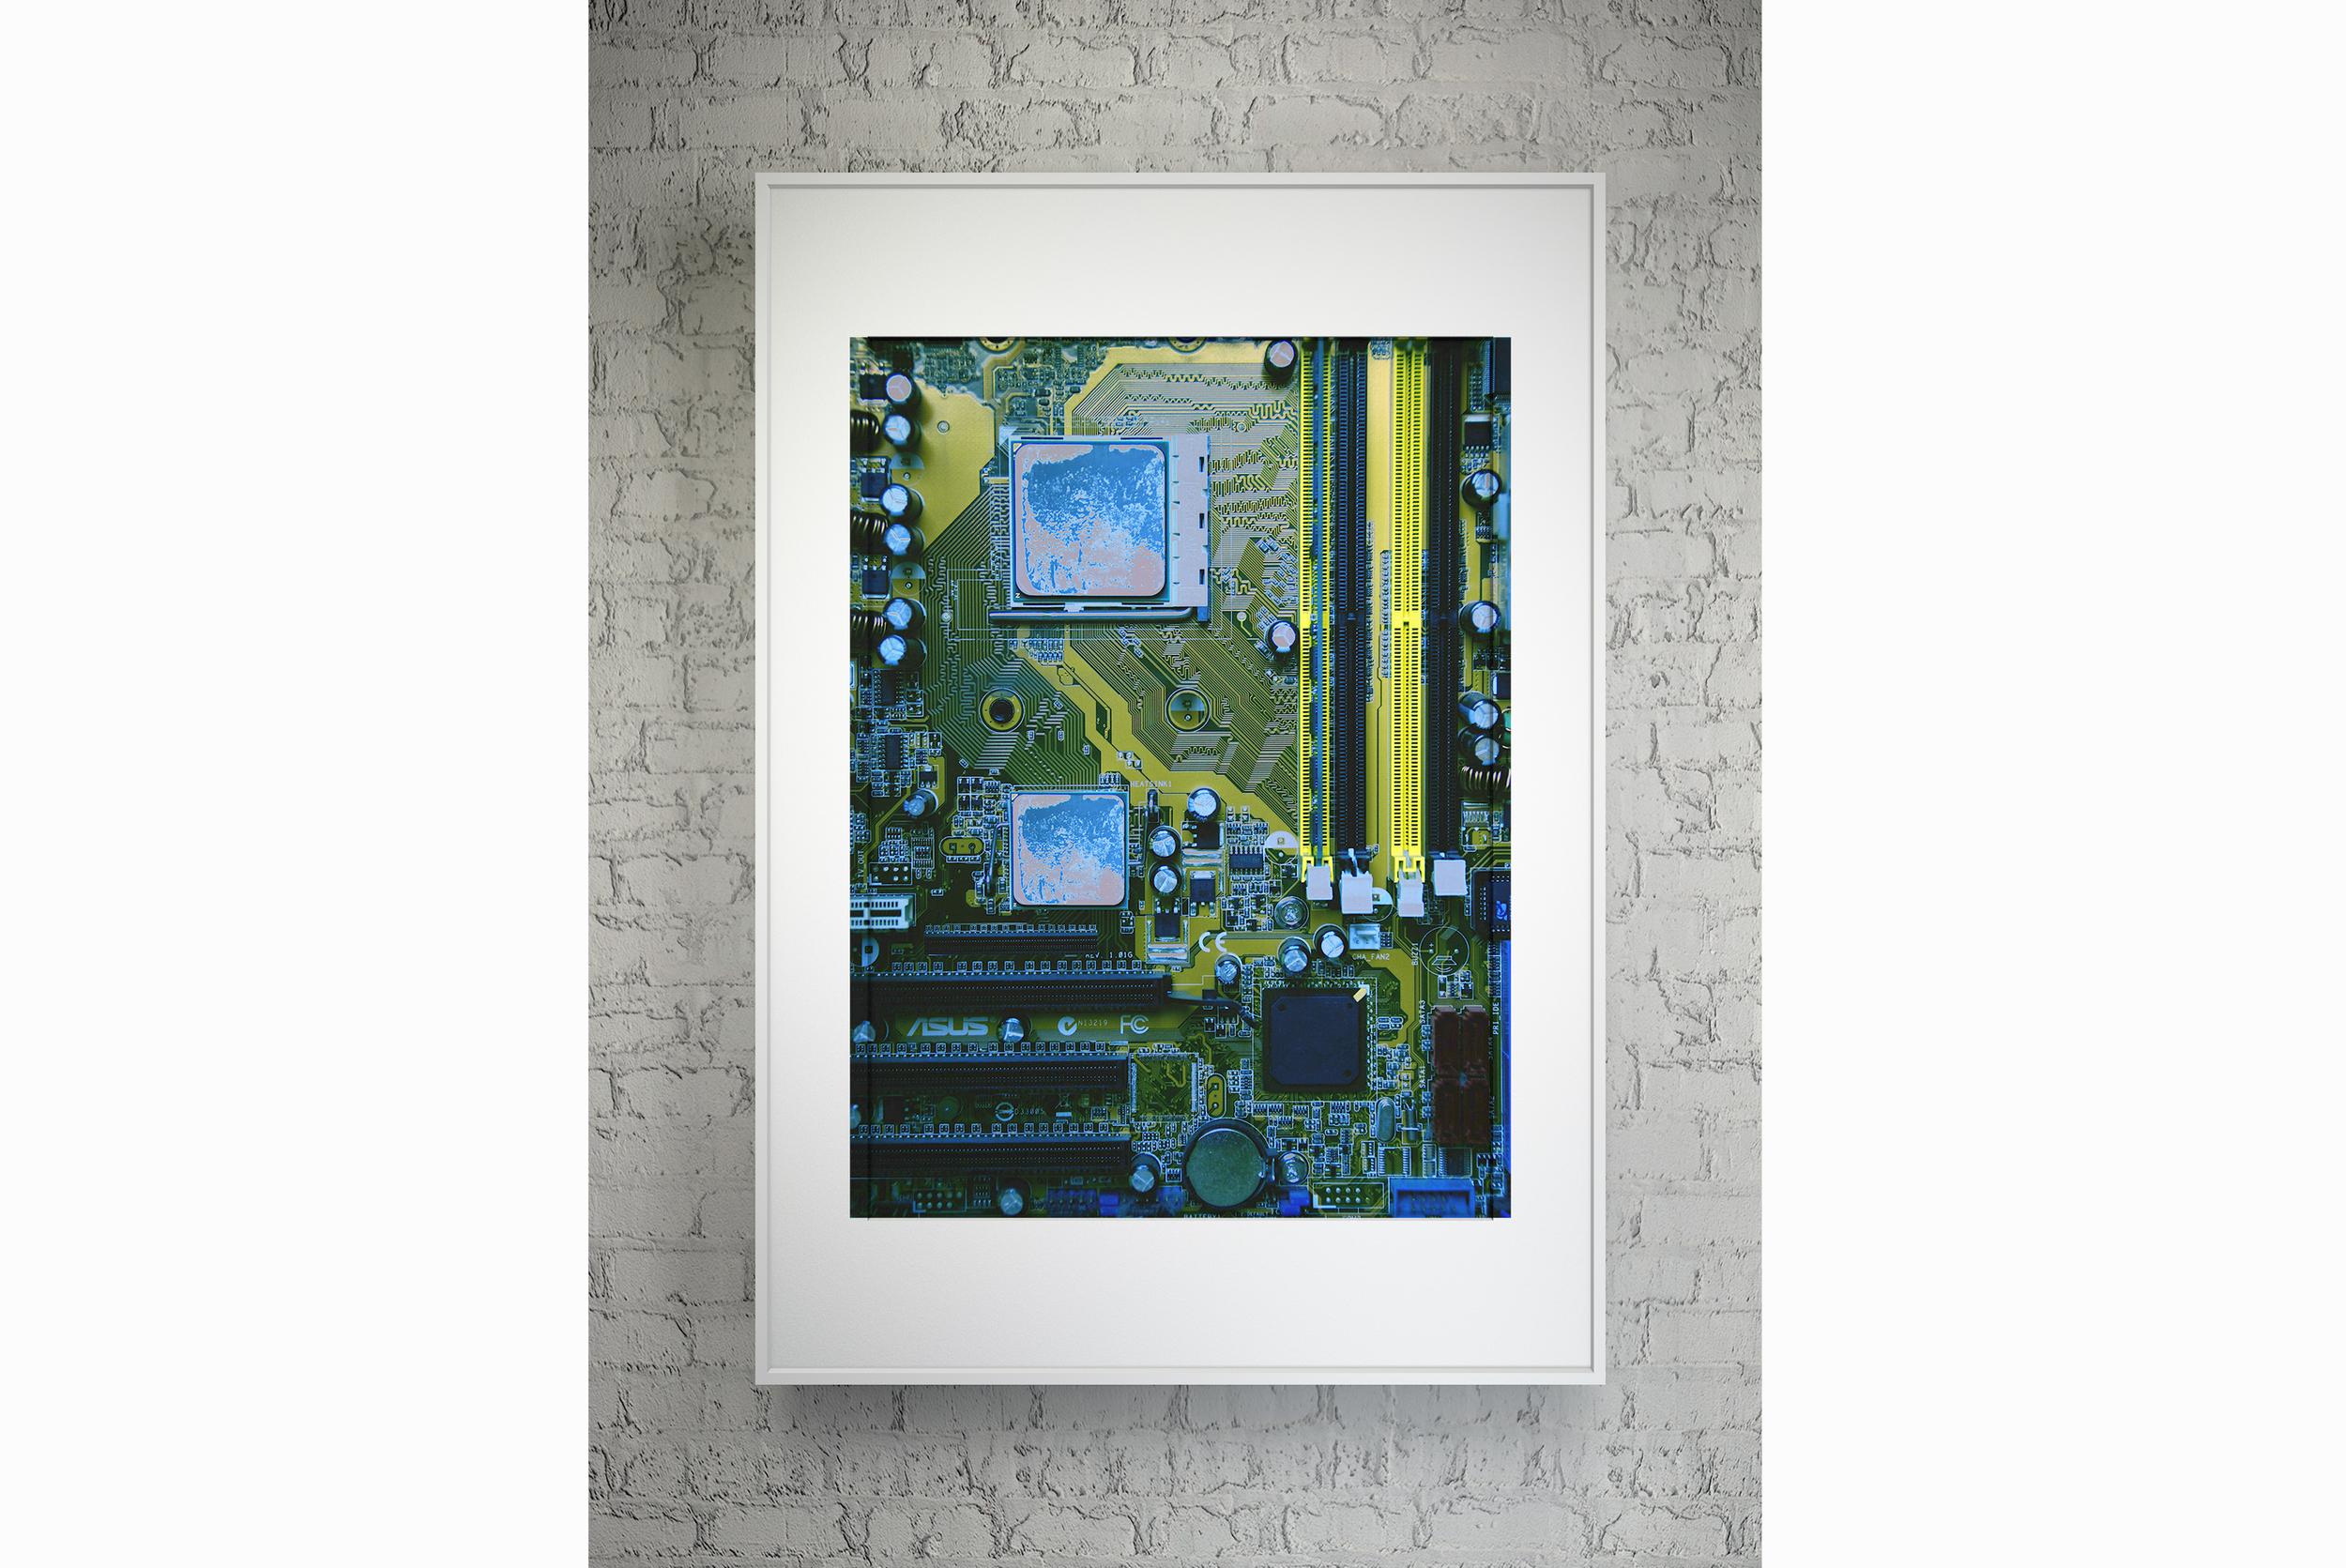 gallery framed motherboard.jpg